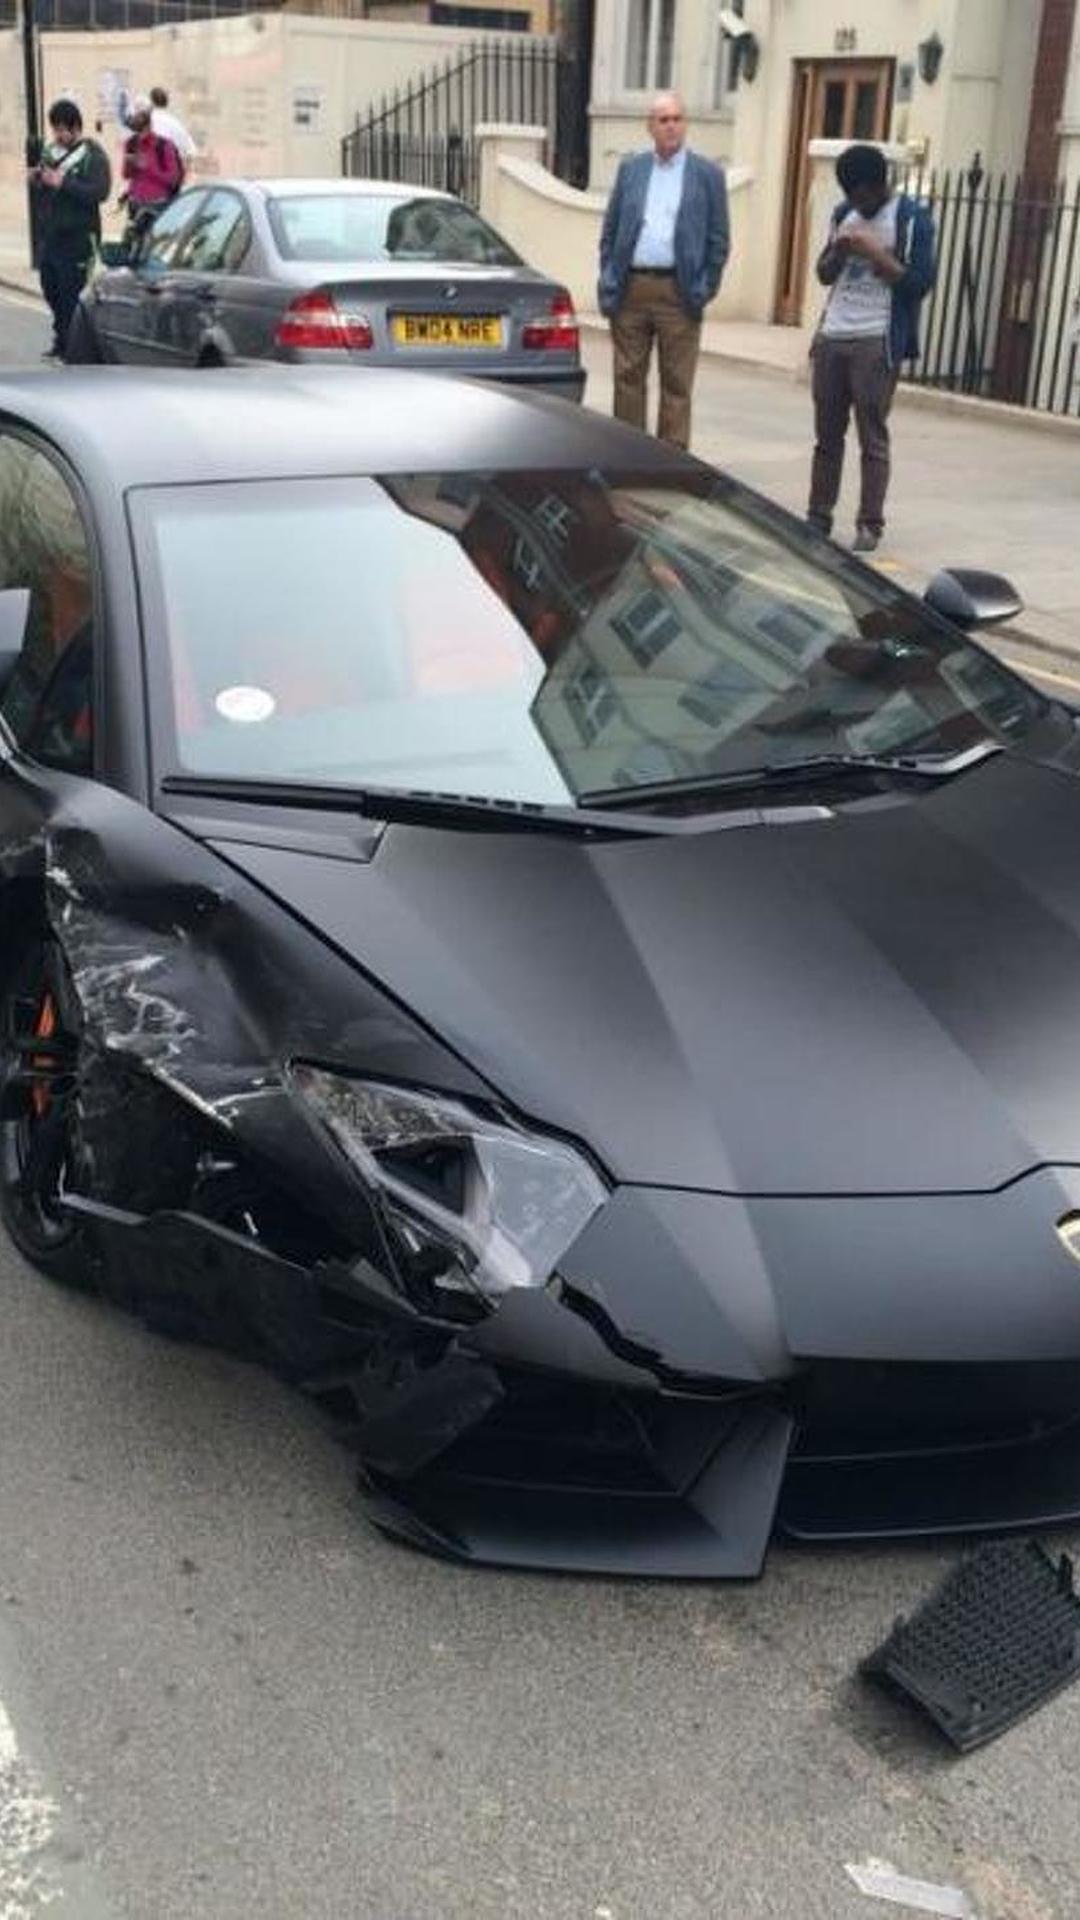 Matte Black Lamborghini Aventador Collides With Bmw 320d In London Video